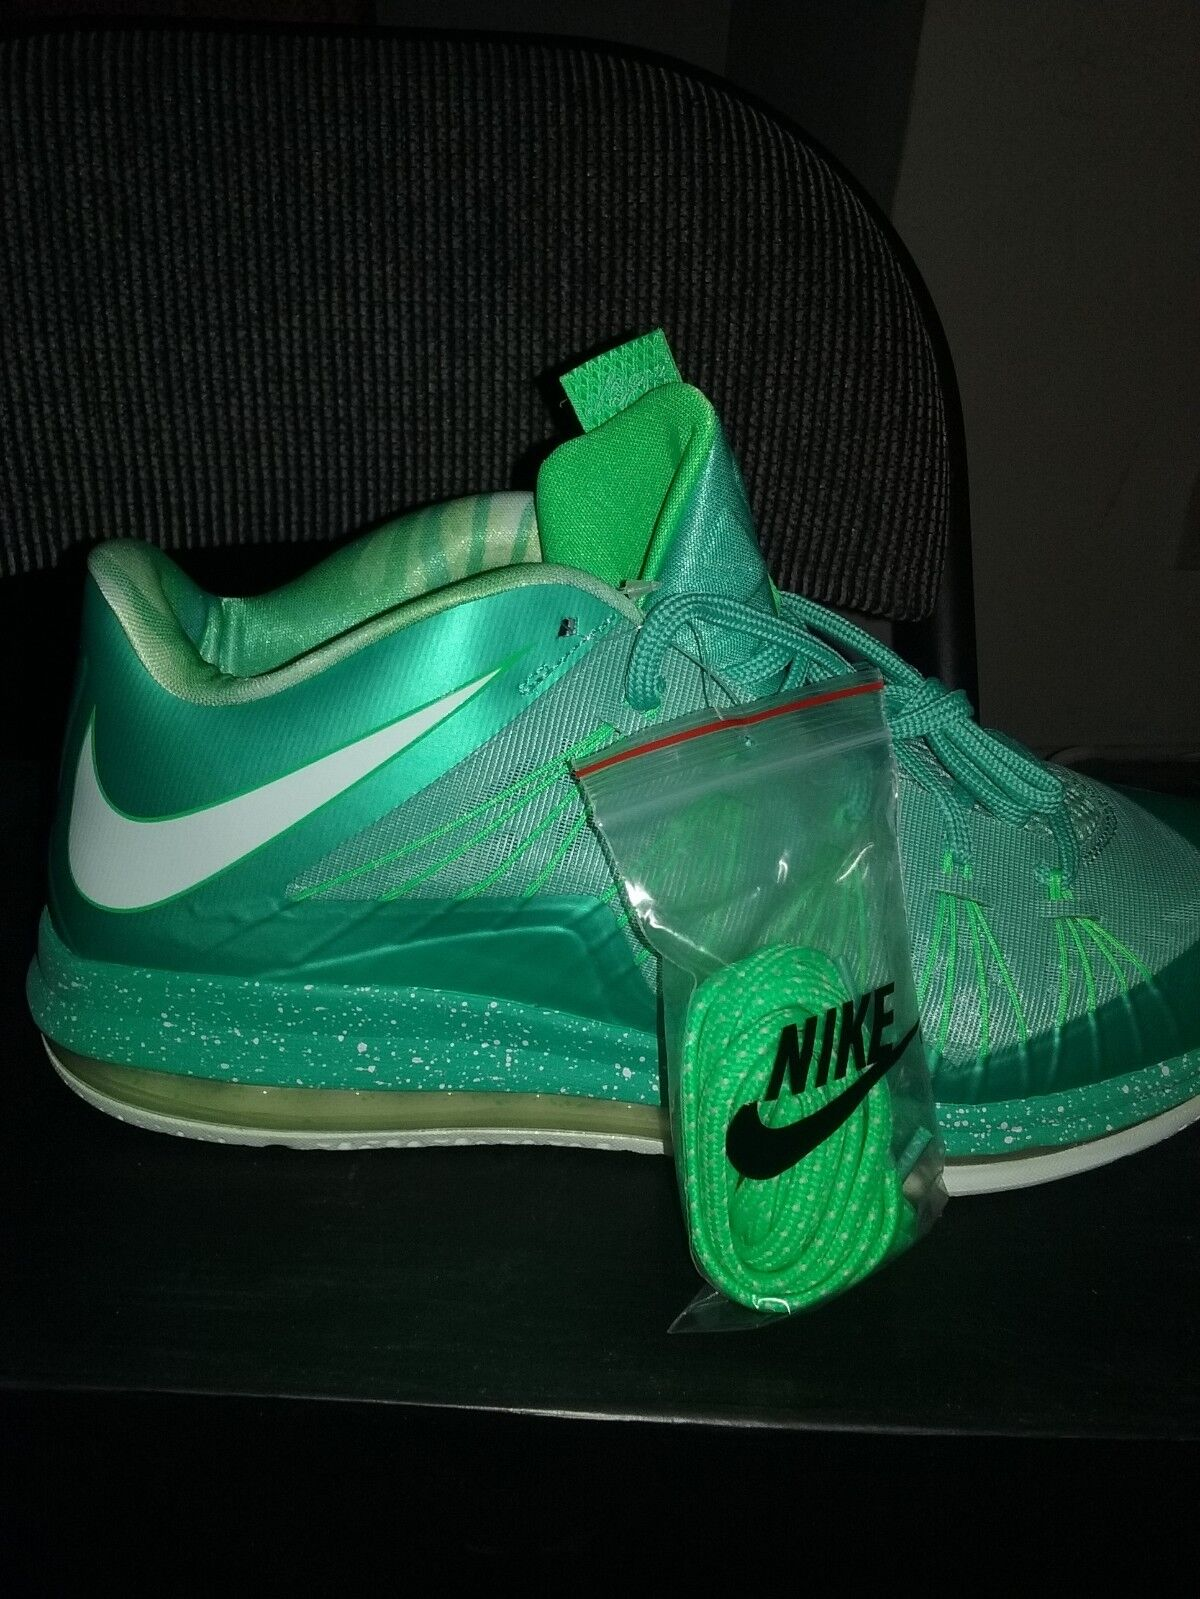 Nike air max lebron james x 10 basso pasqua verde Uomota scarpe uomo numero 12